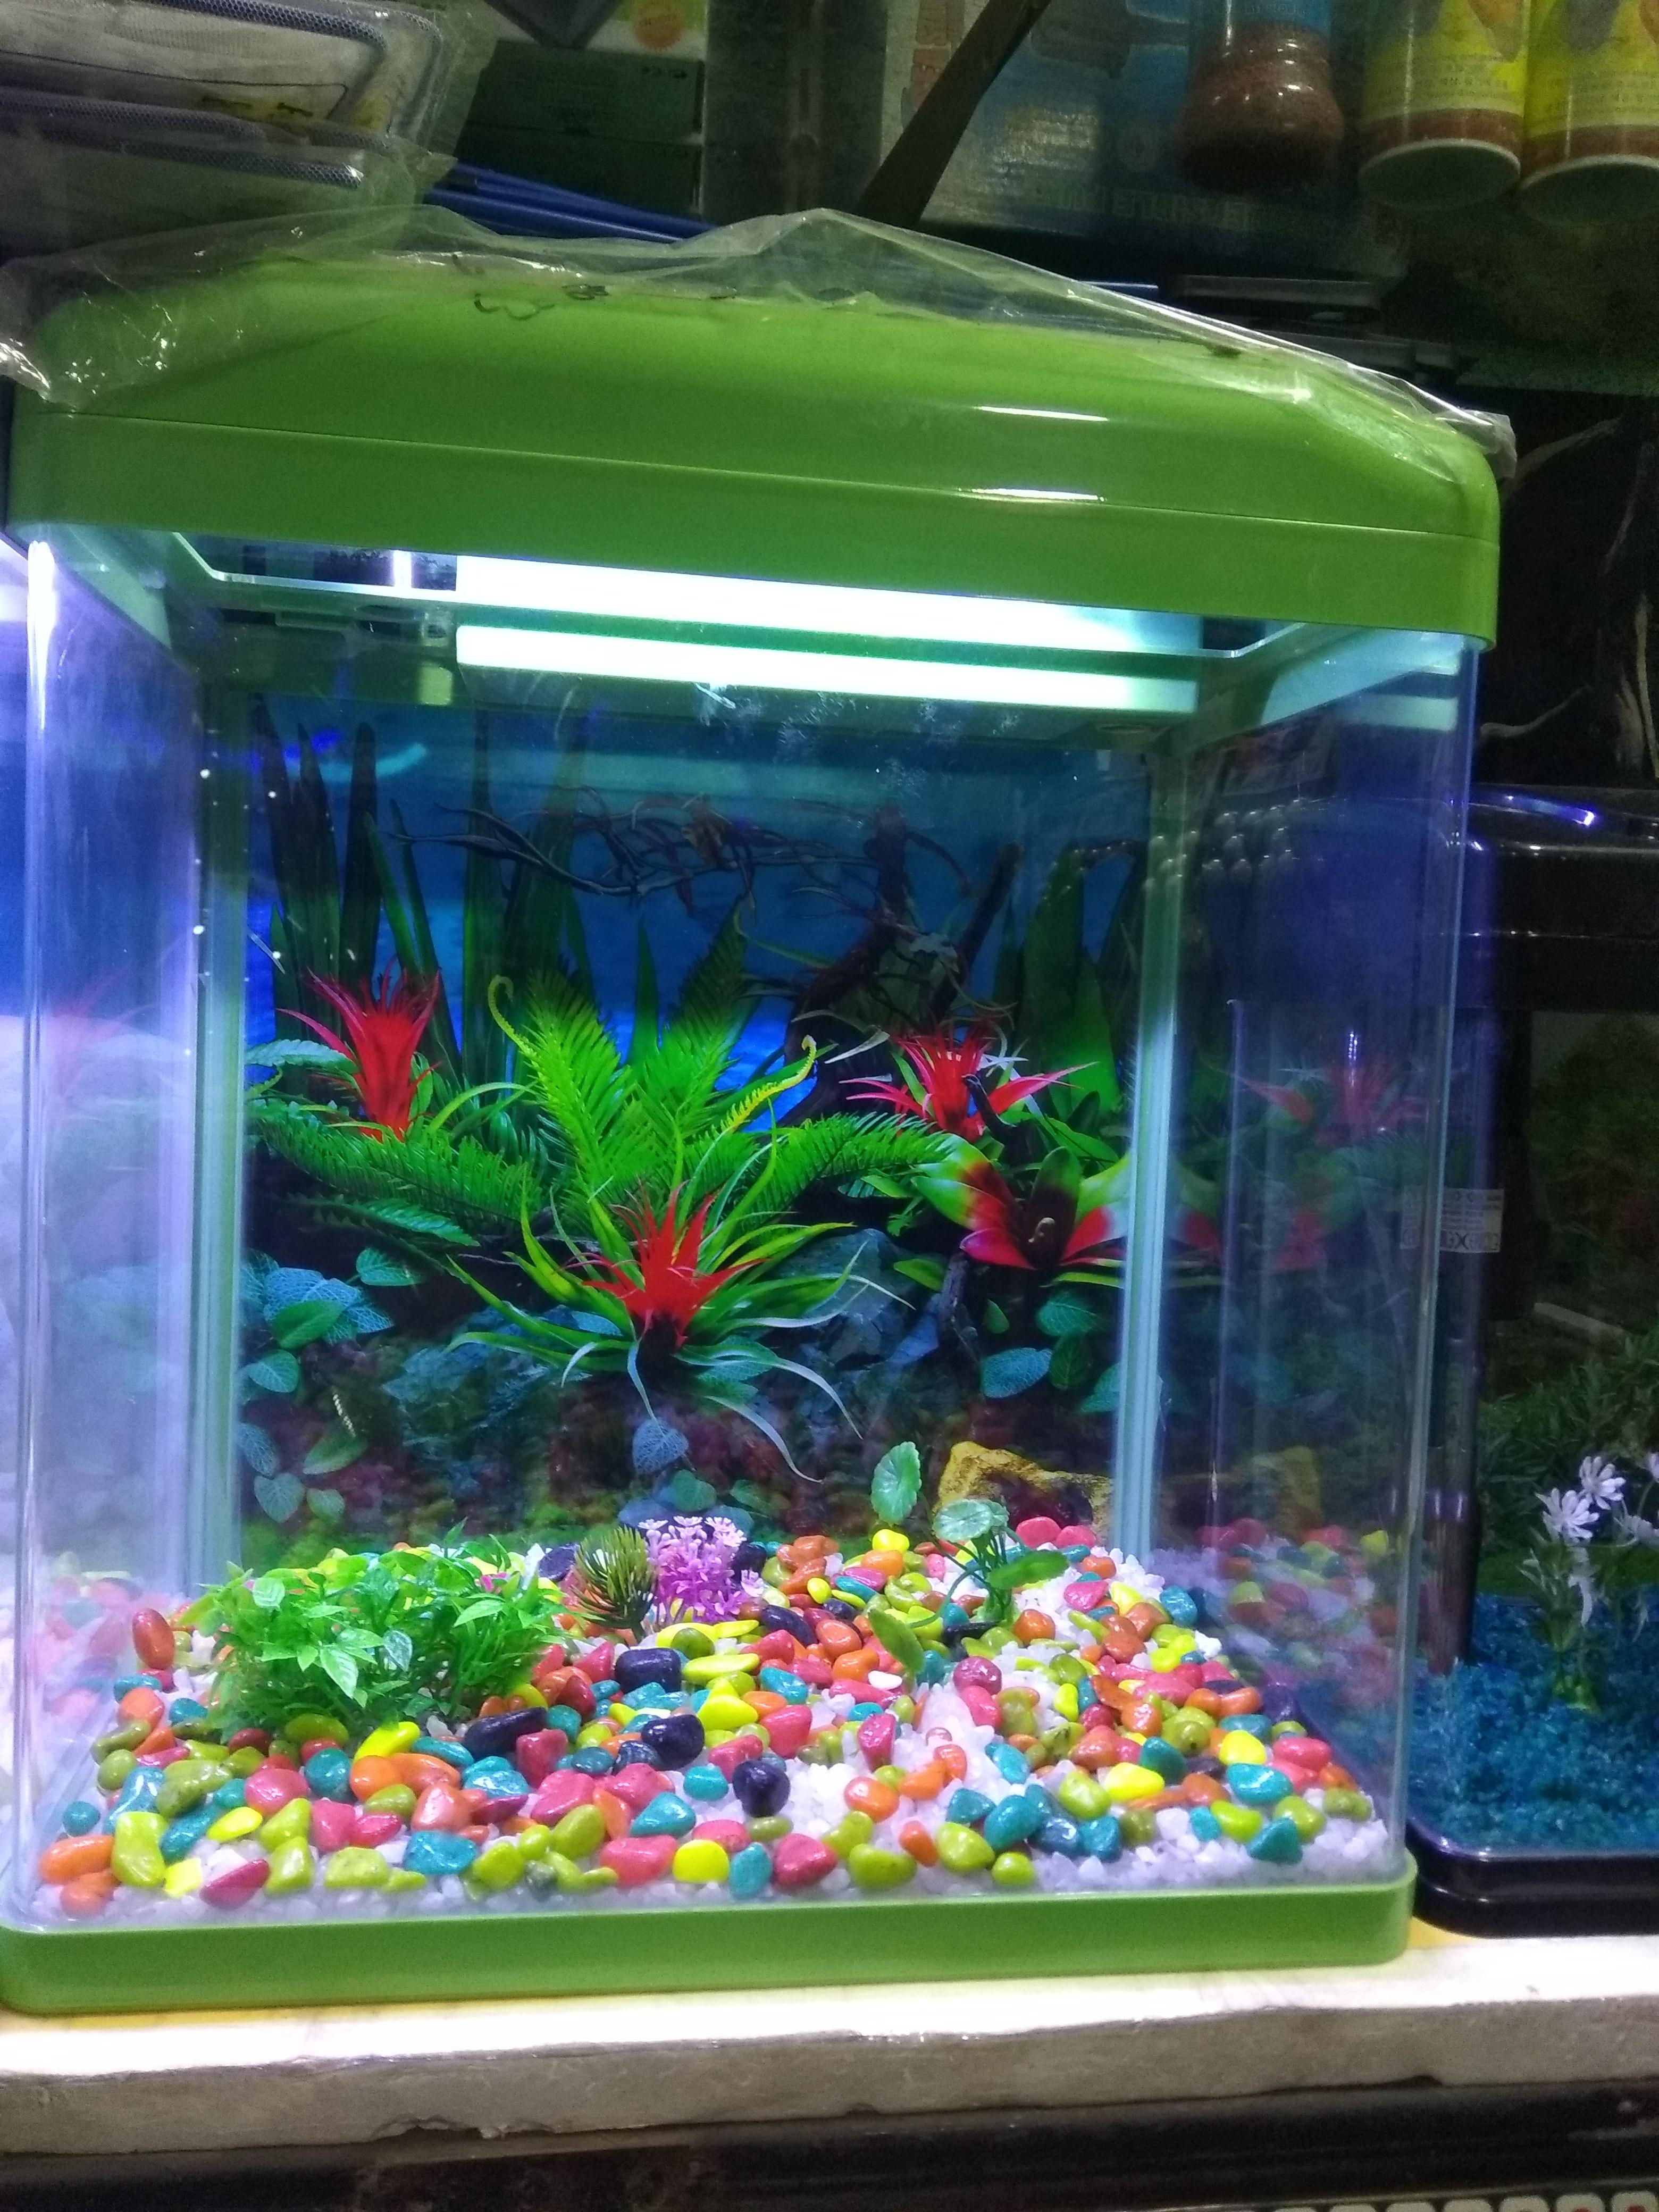 Aquarium shop 22 D Chandigarh  9915332799